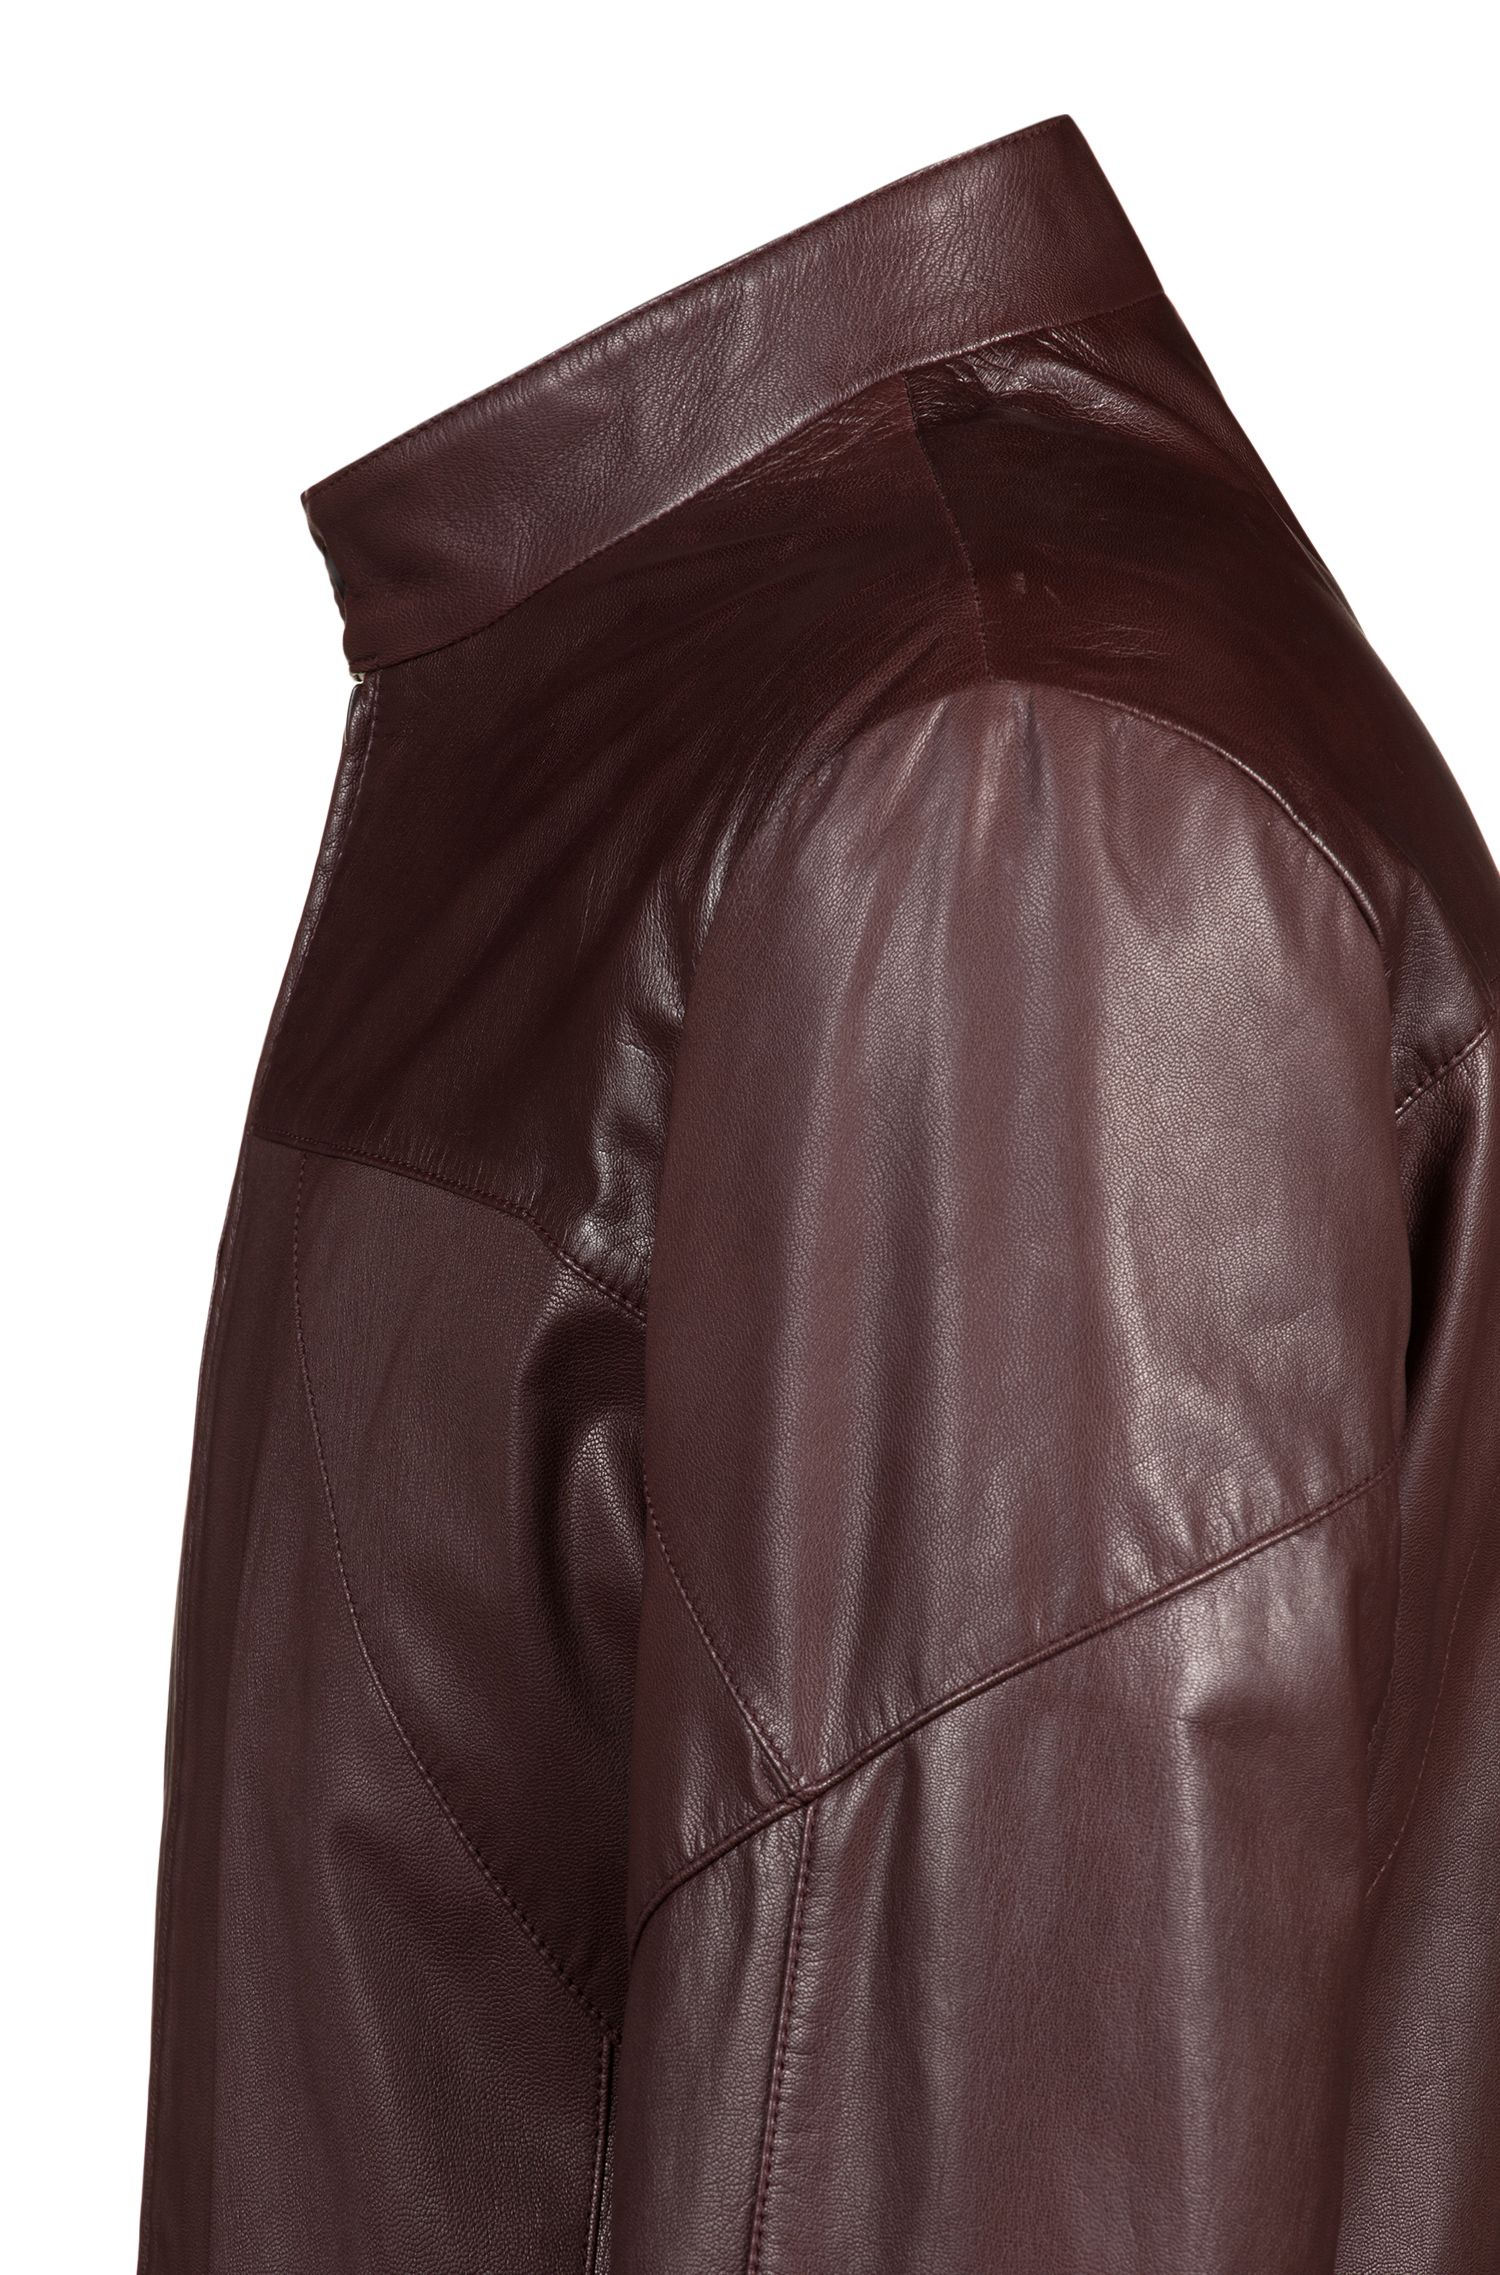 Hugo Boss - Slim-fit biker jacket in nappa leather - 5